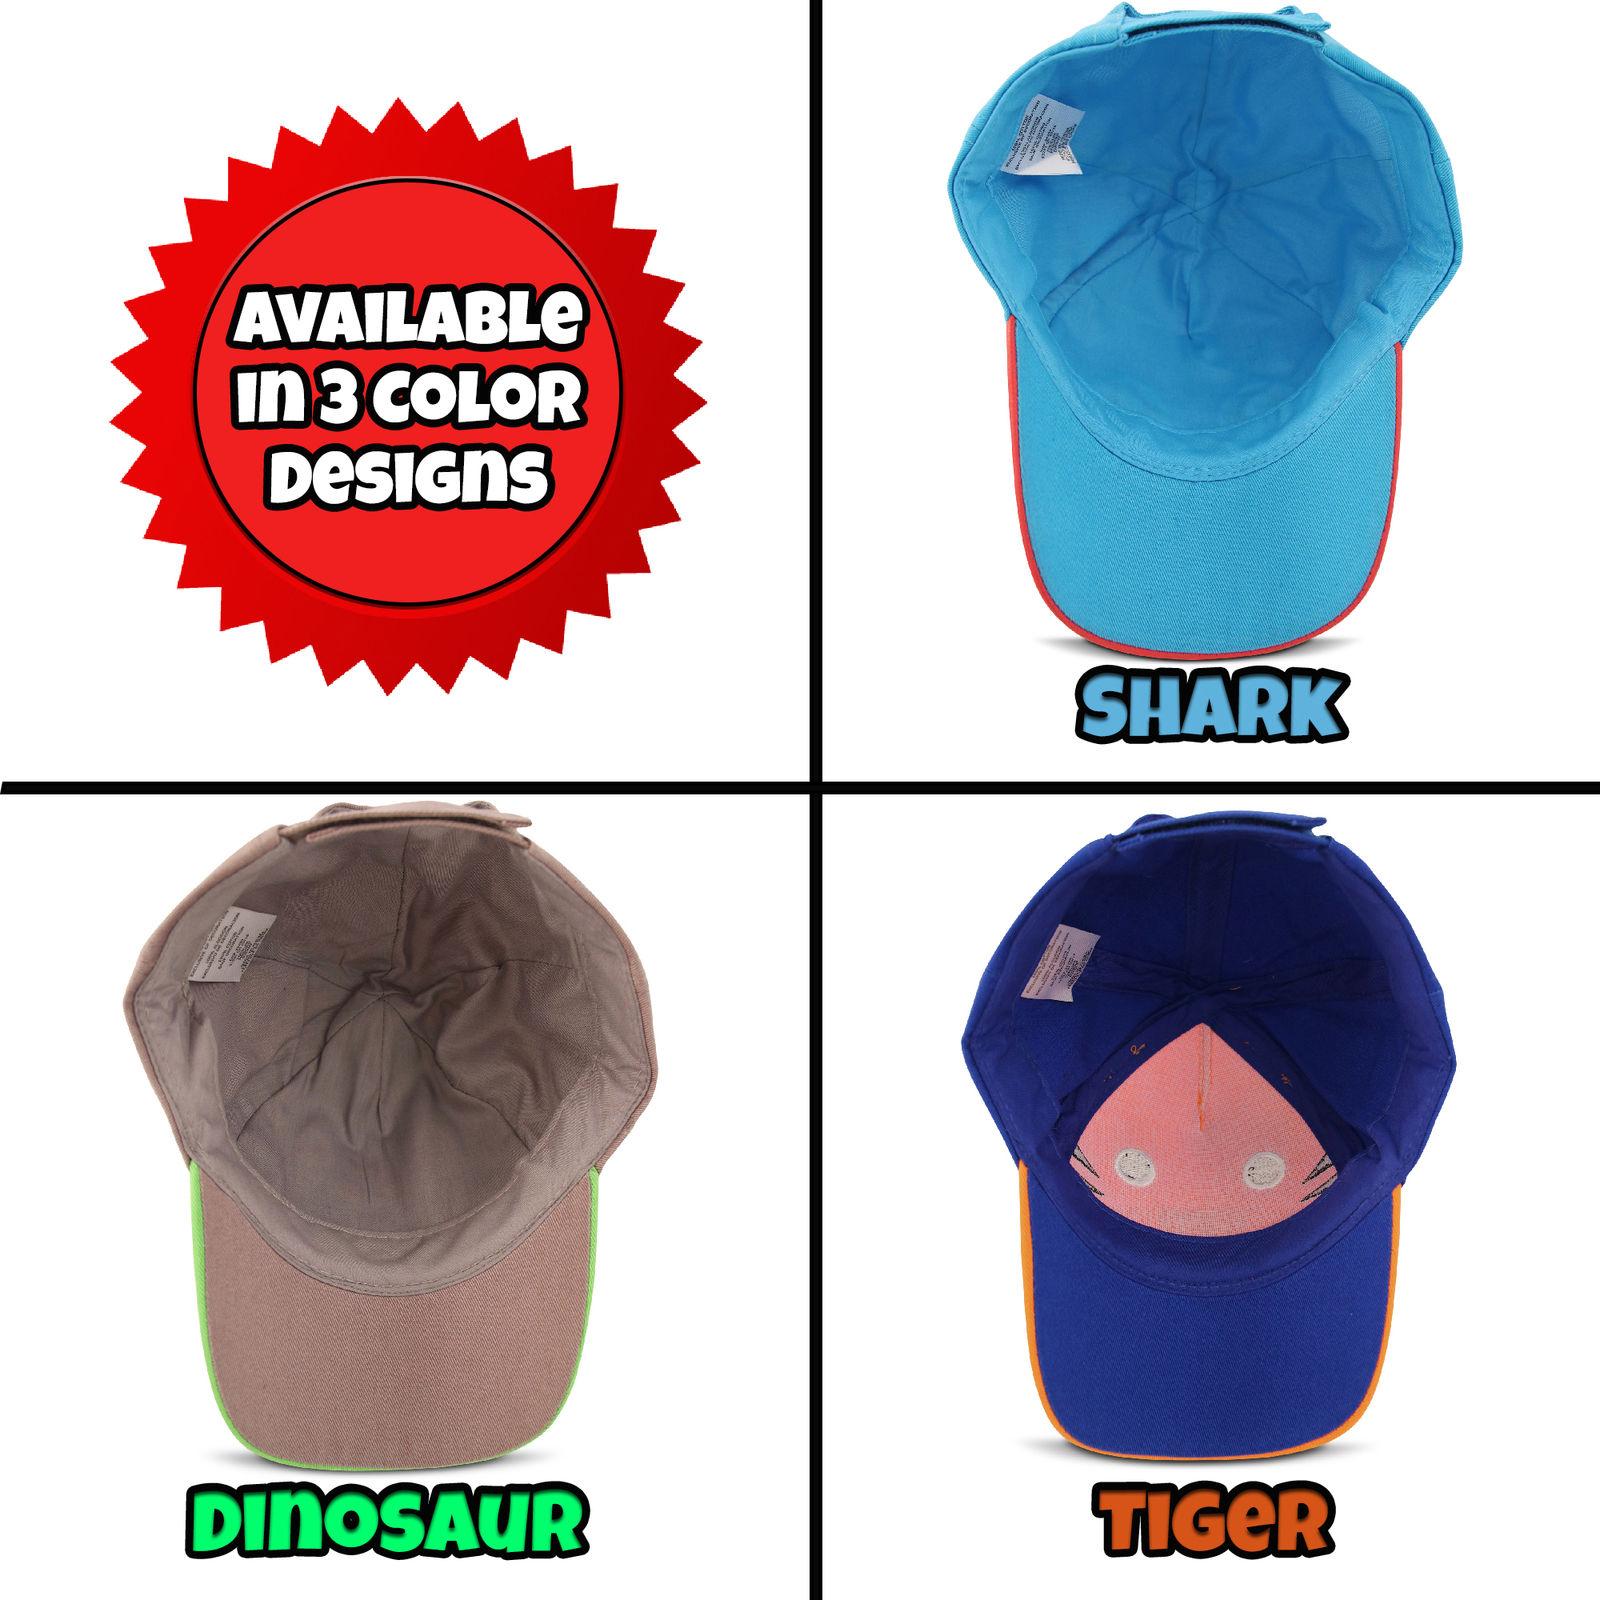 5ad2d78d ABG Accessories - ABG Accessories Toddler Boys Cotton Baseball Cap,  Assorted Critter Designs, Age 2-4 - Walmart.com